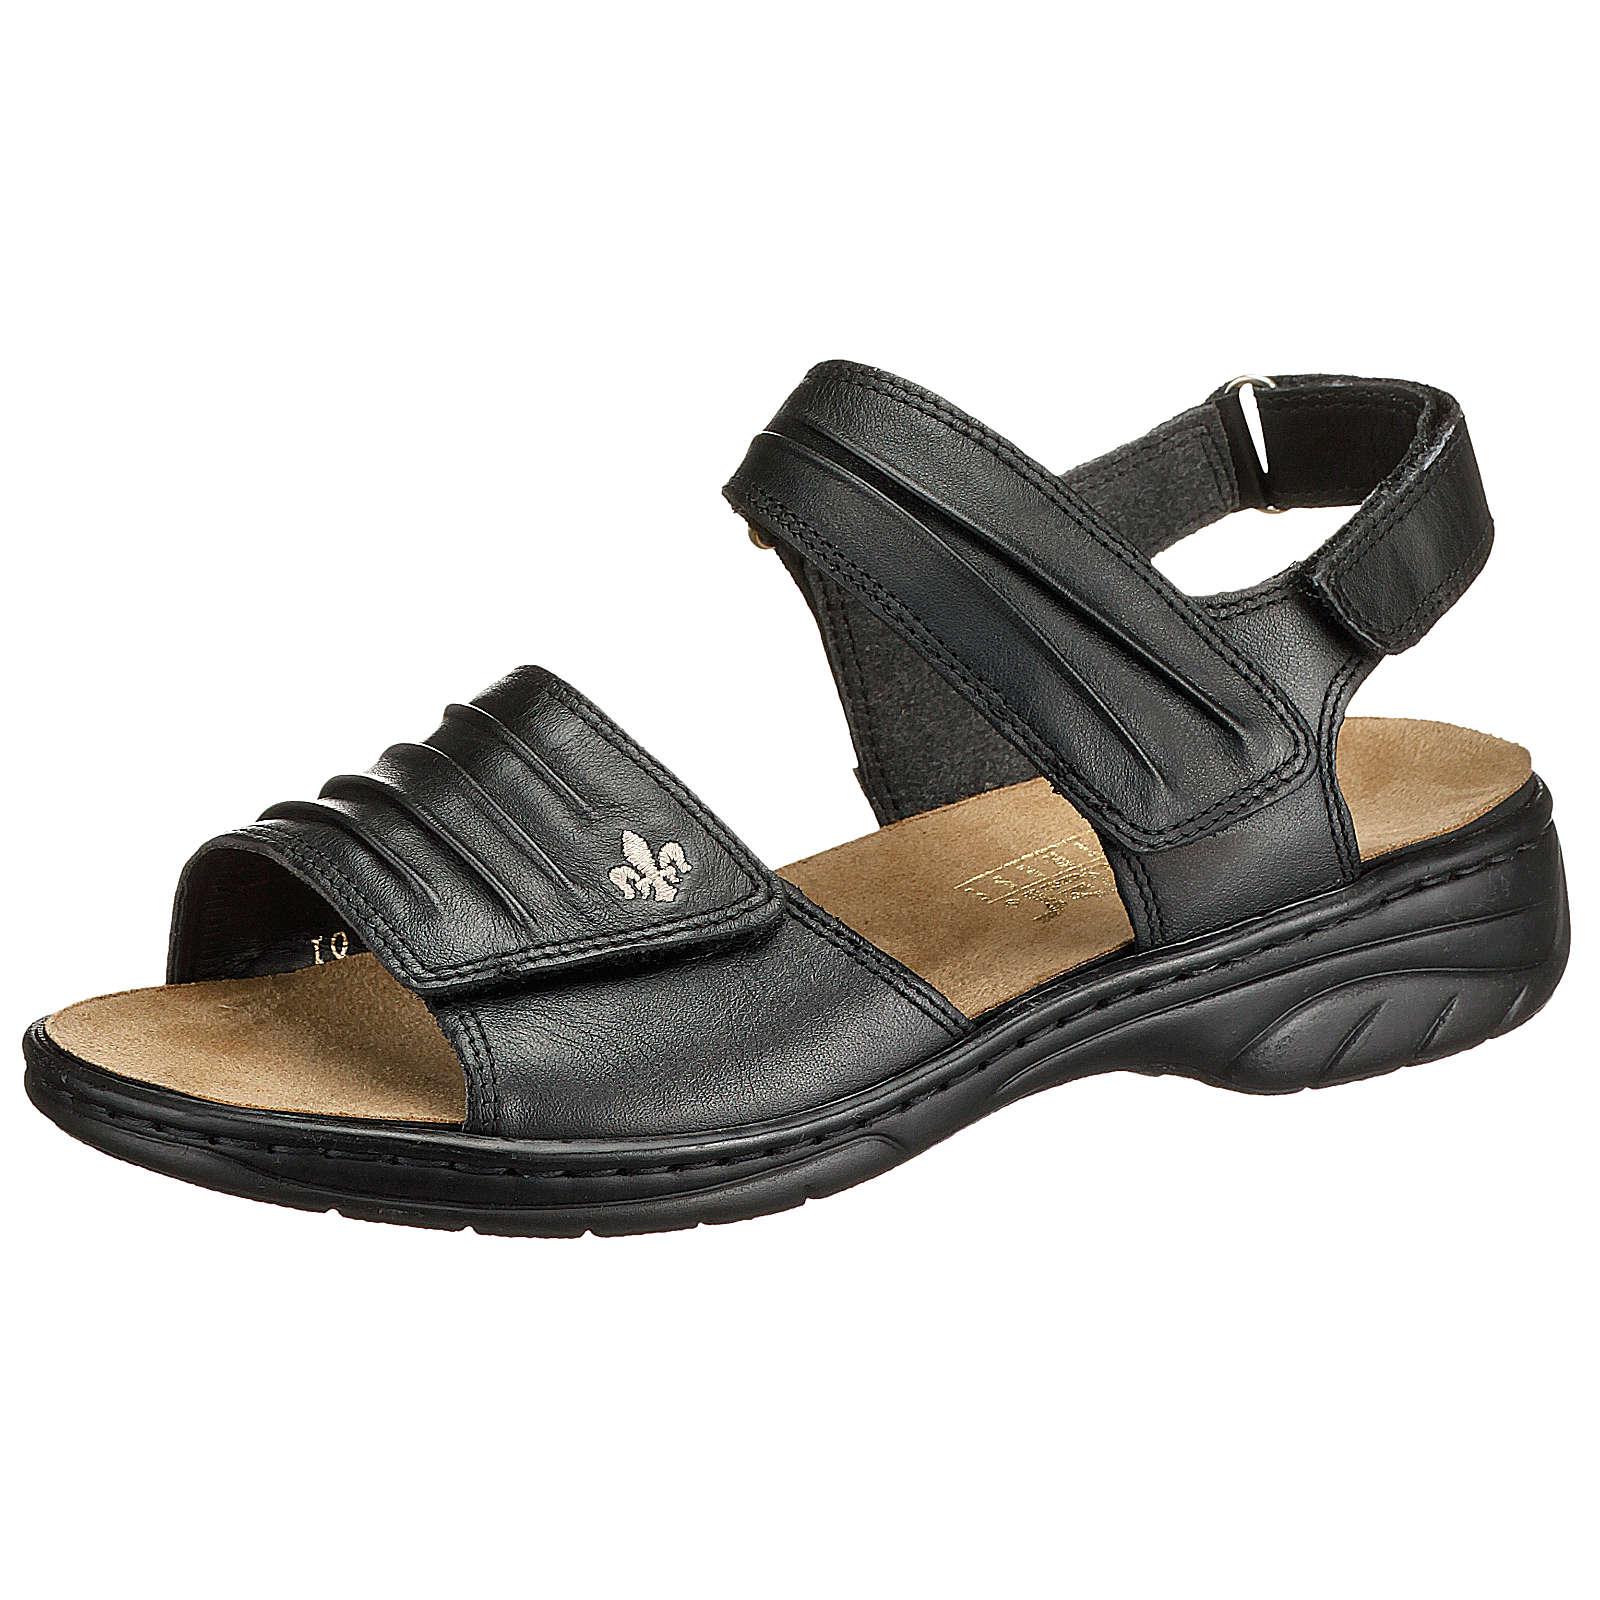 rabatt damen schuhe sandalen. Black Bedroom Furniture Sets. Home Design Ideas